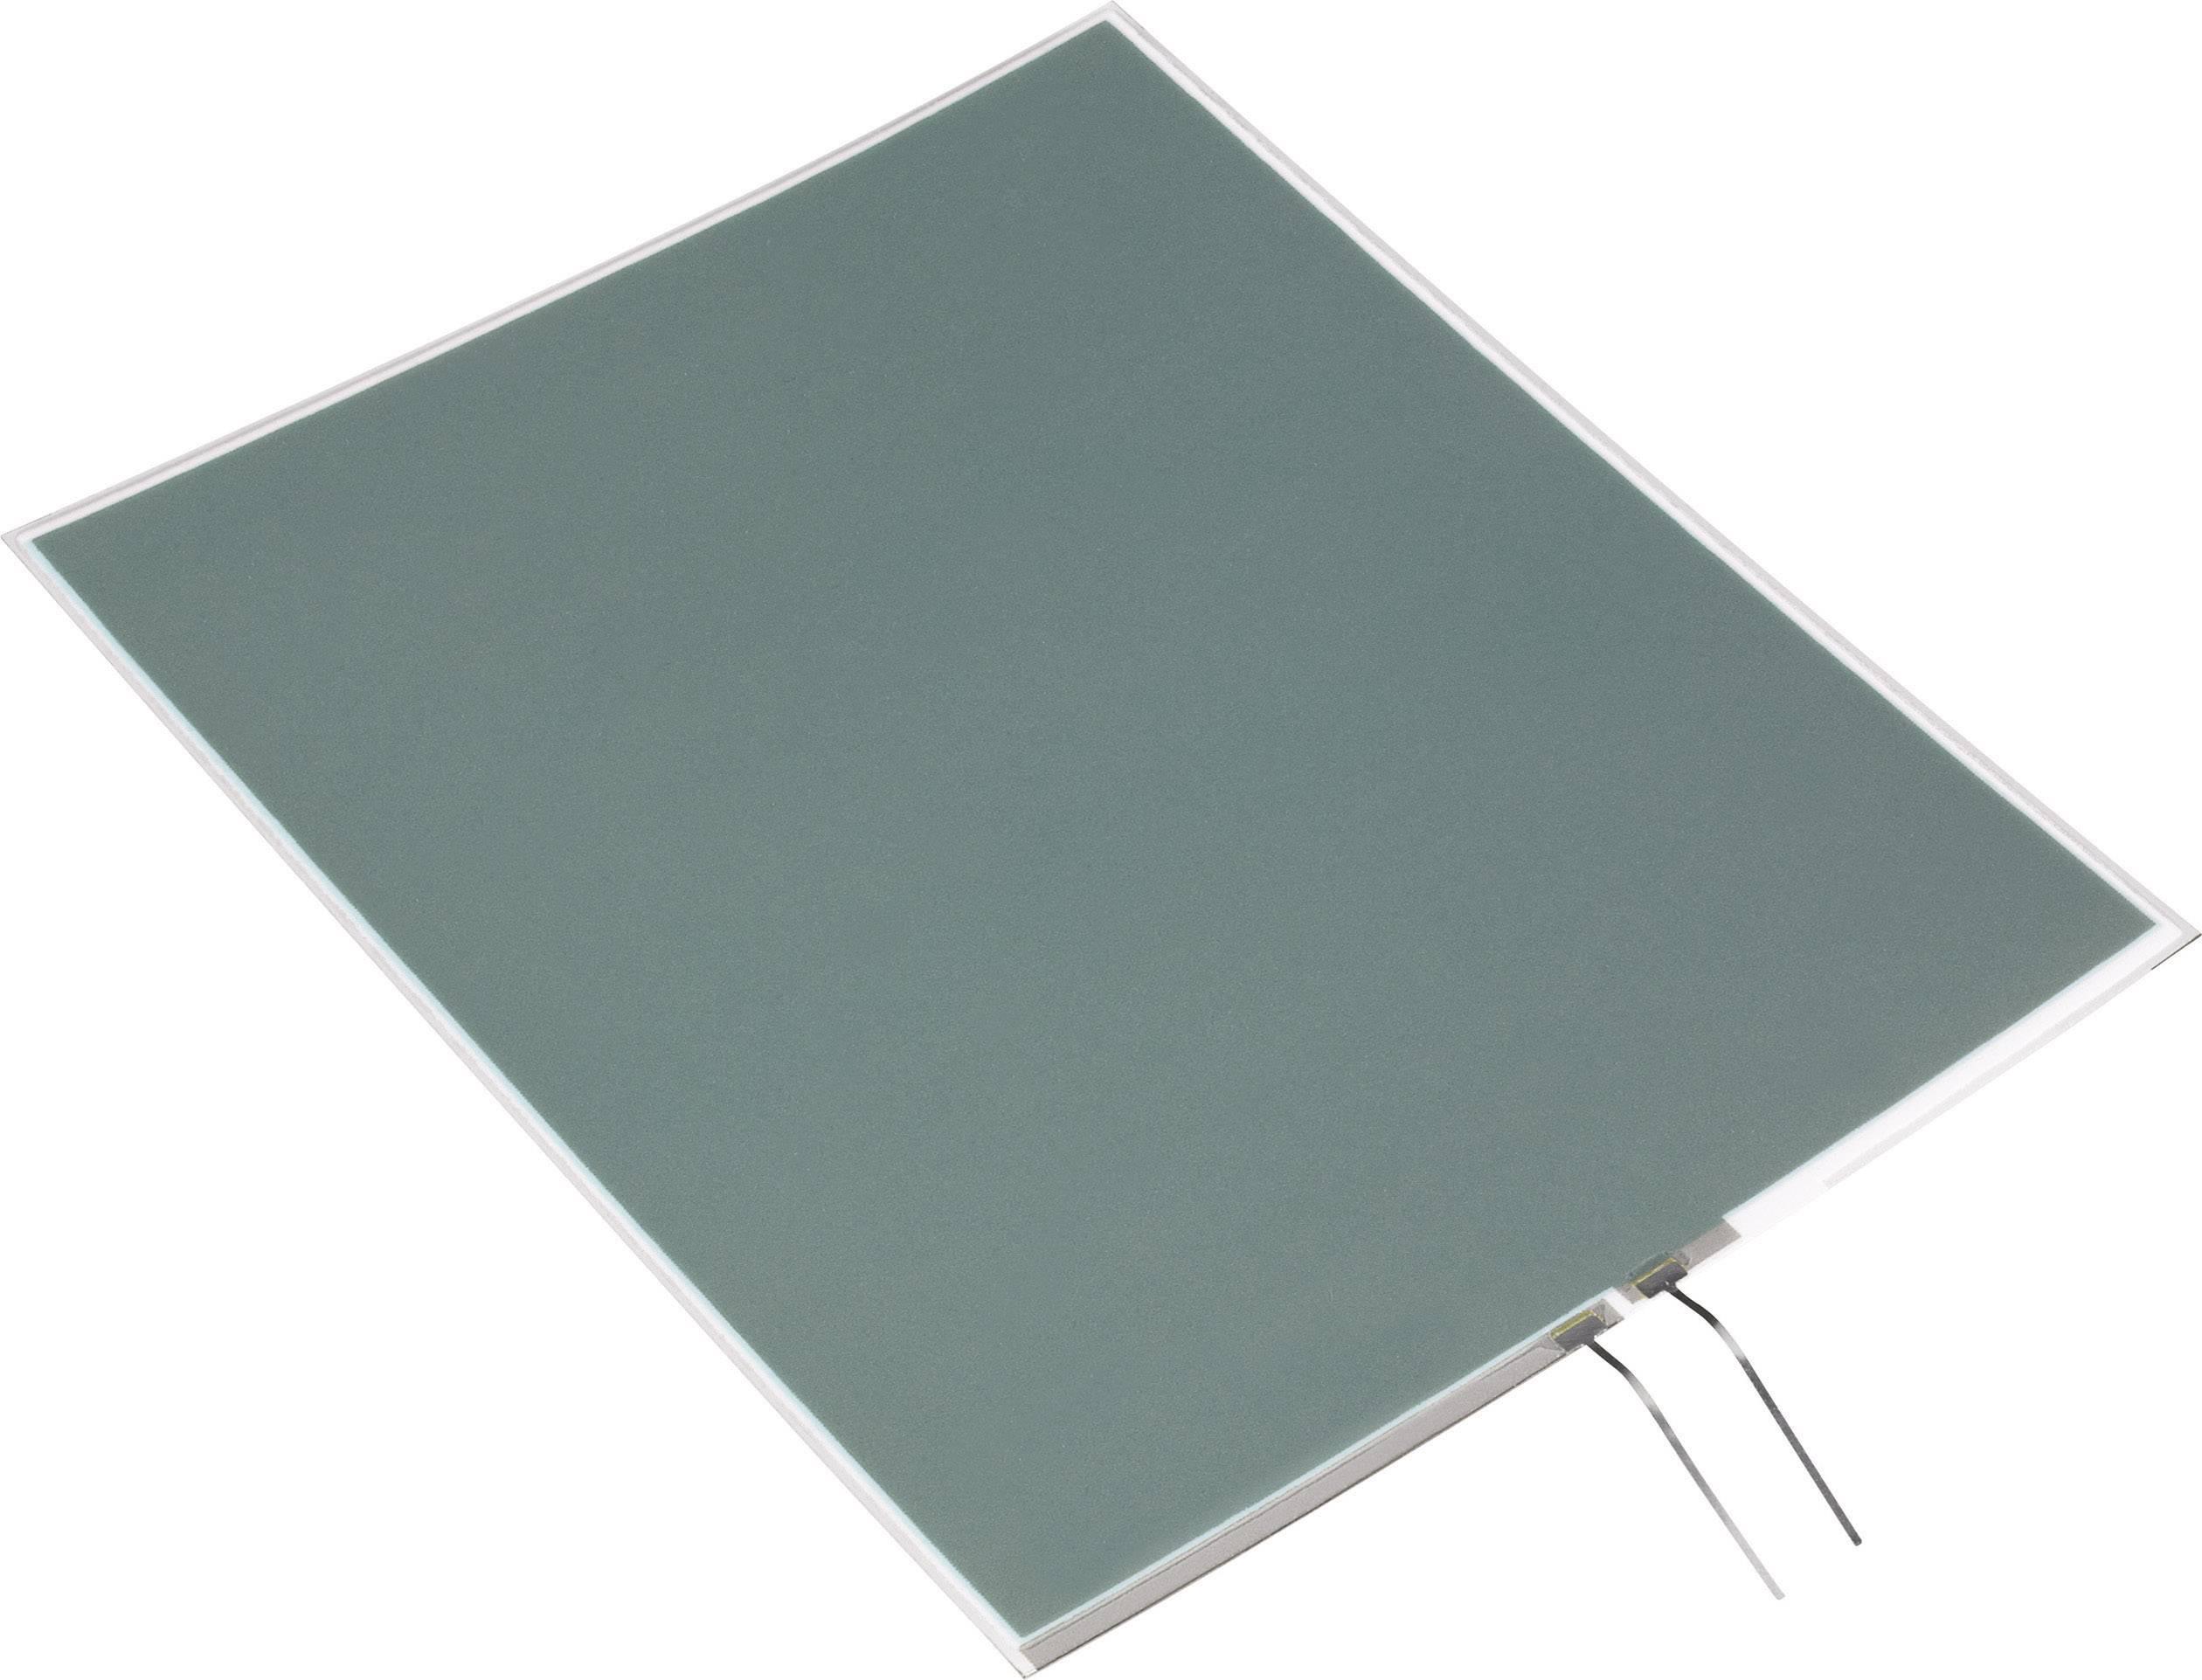 Svetelná fólia Conrad Components modrá, (d x š x v) 138 x 34 x 0.5 mm